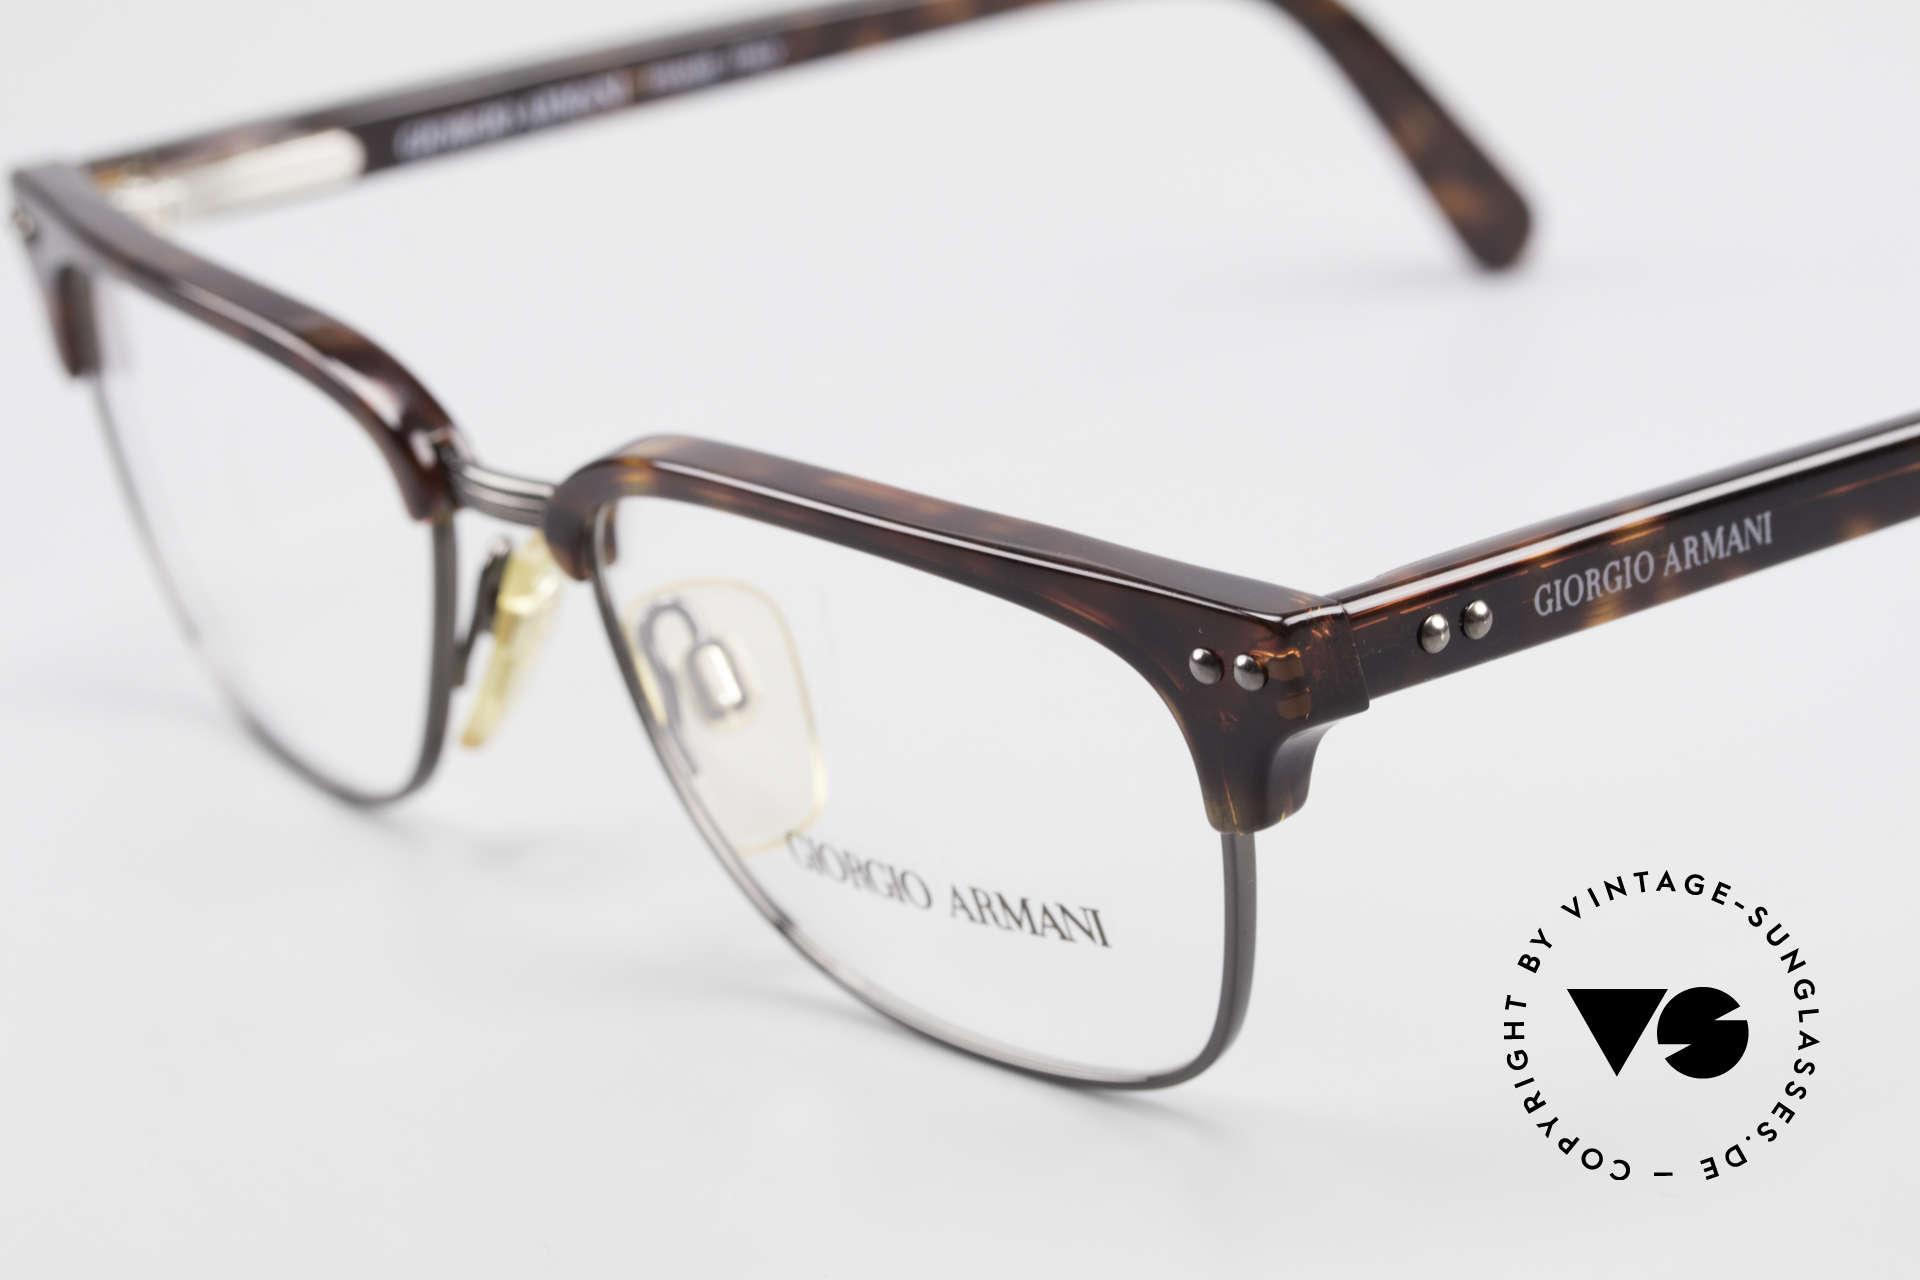 Giorgio Armani 381 Vintage Specs Clubmaster Style, unworn (like all our vintage Giorgio Armani eyewear), Made for Men